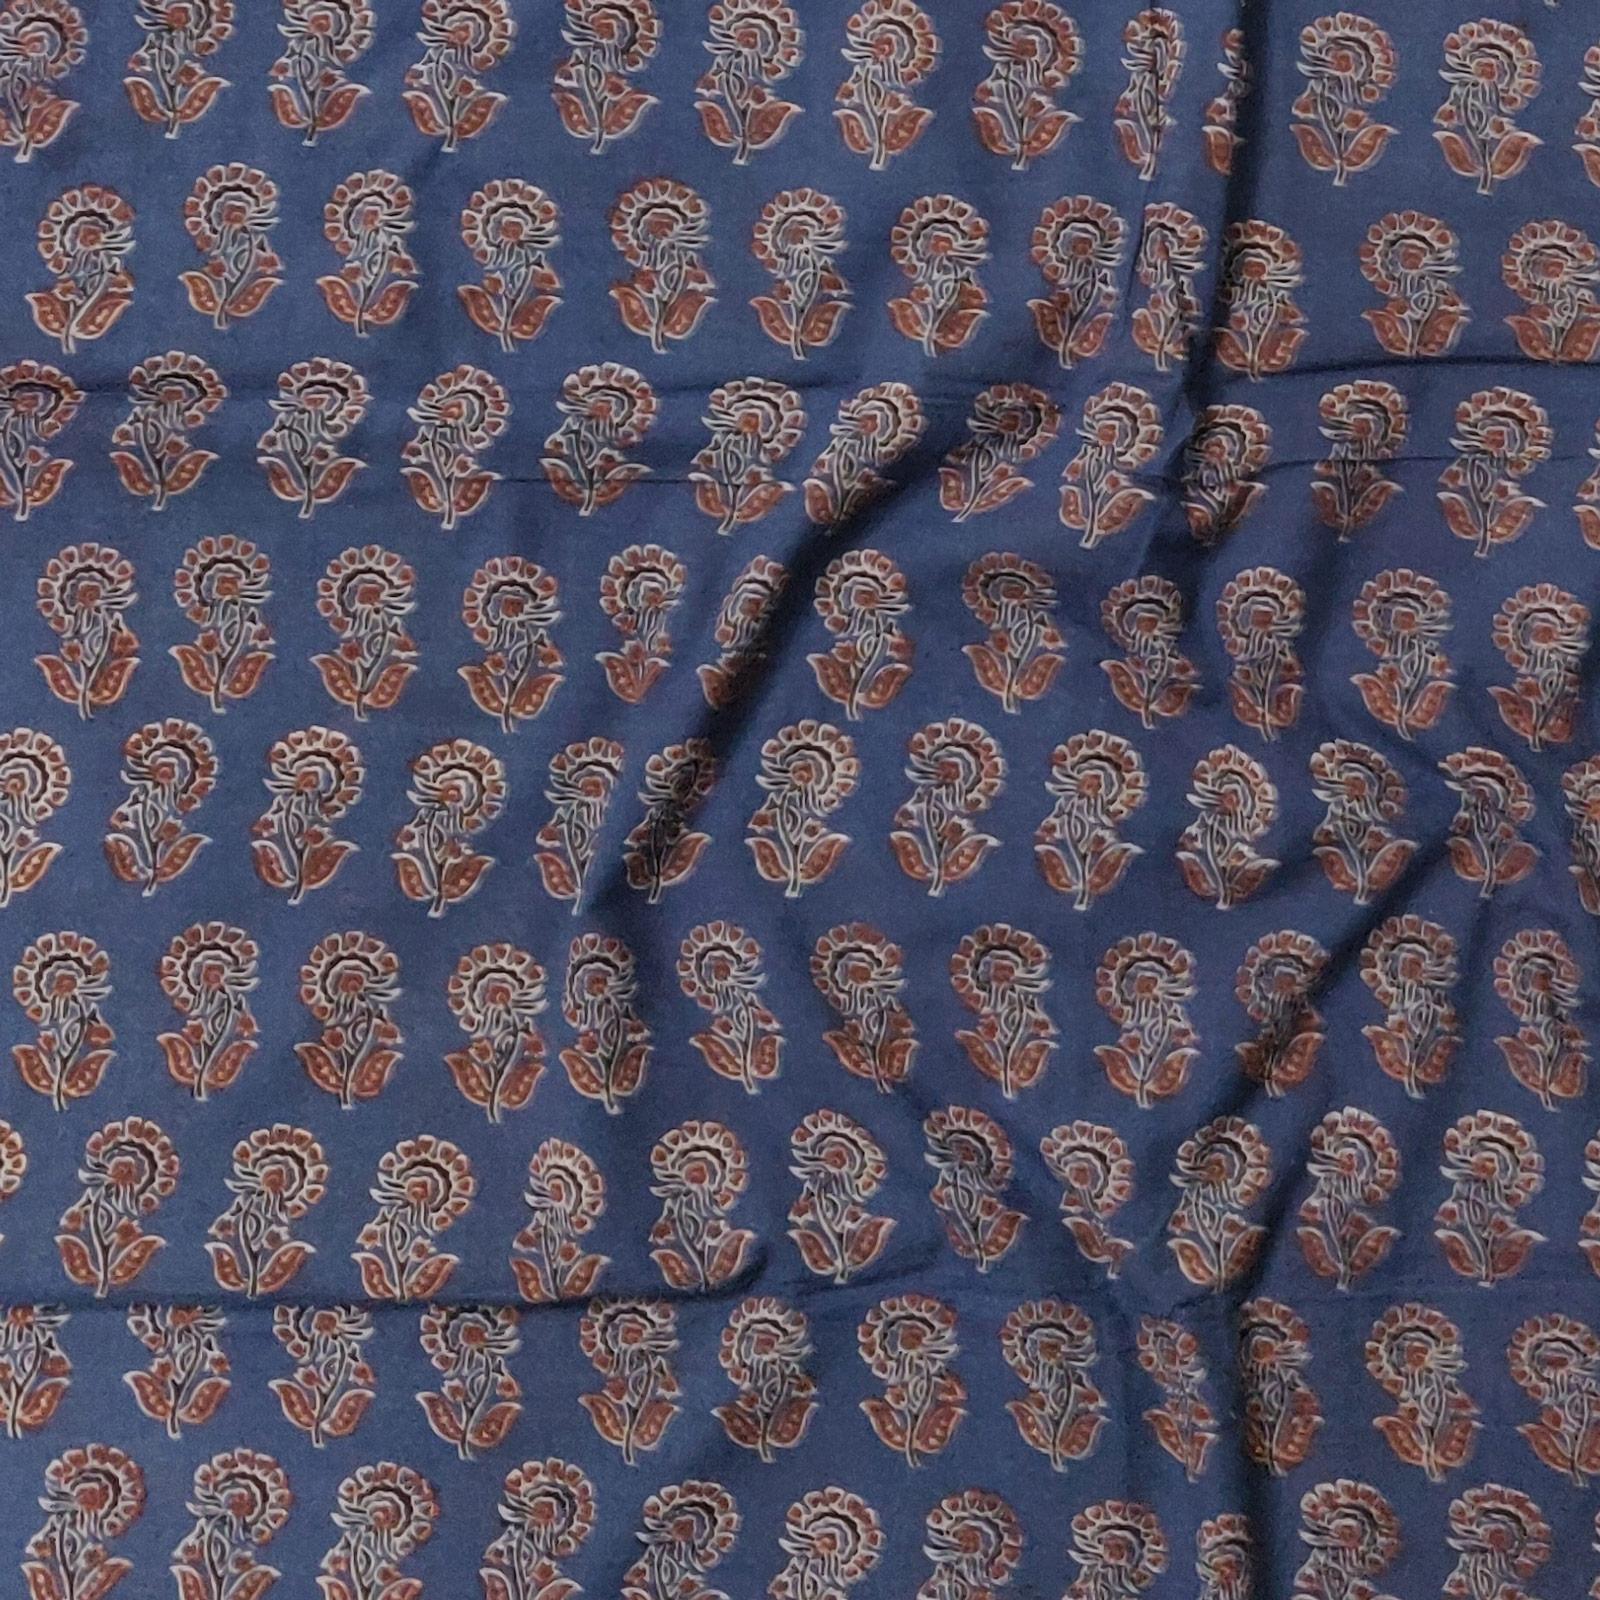 Fabric JMF20